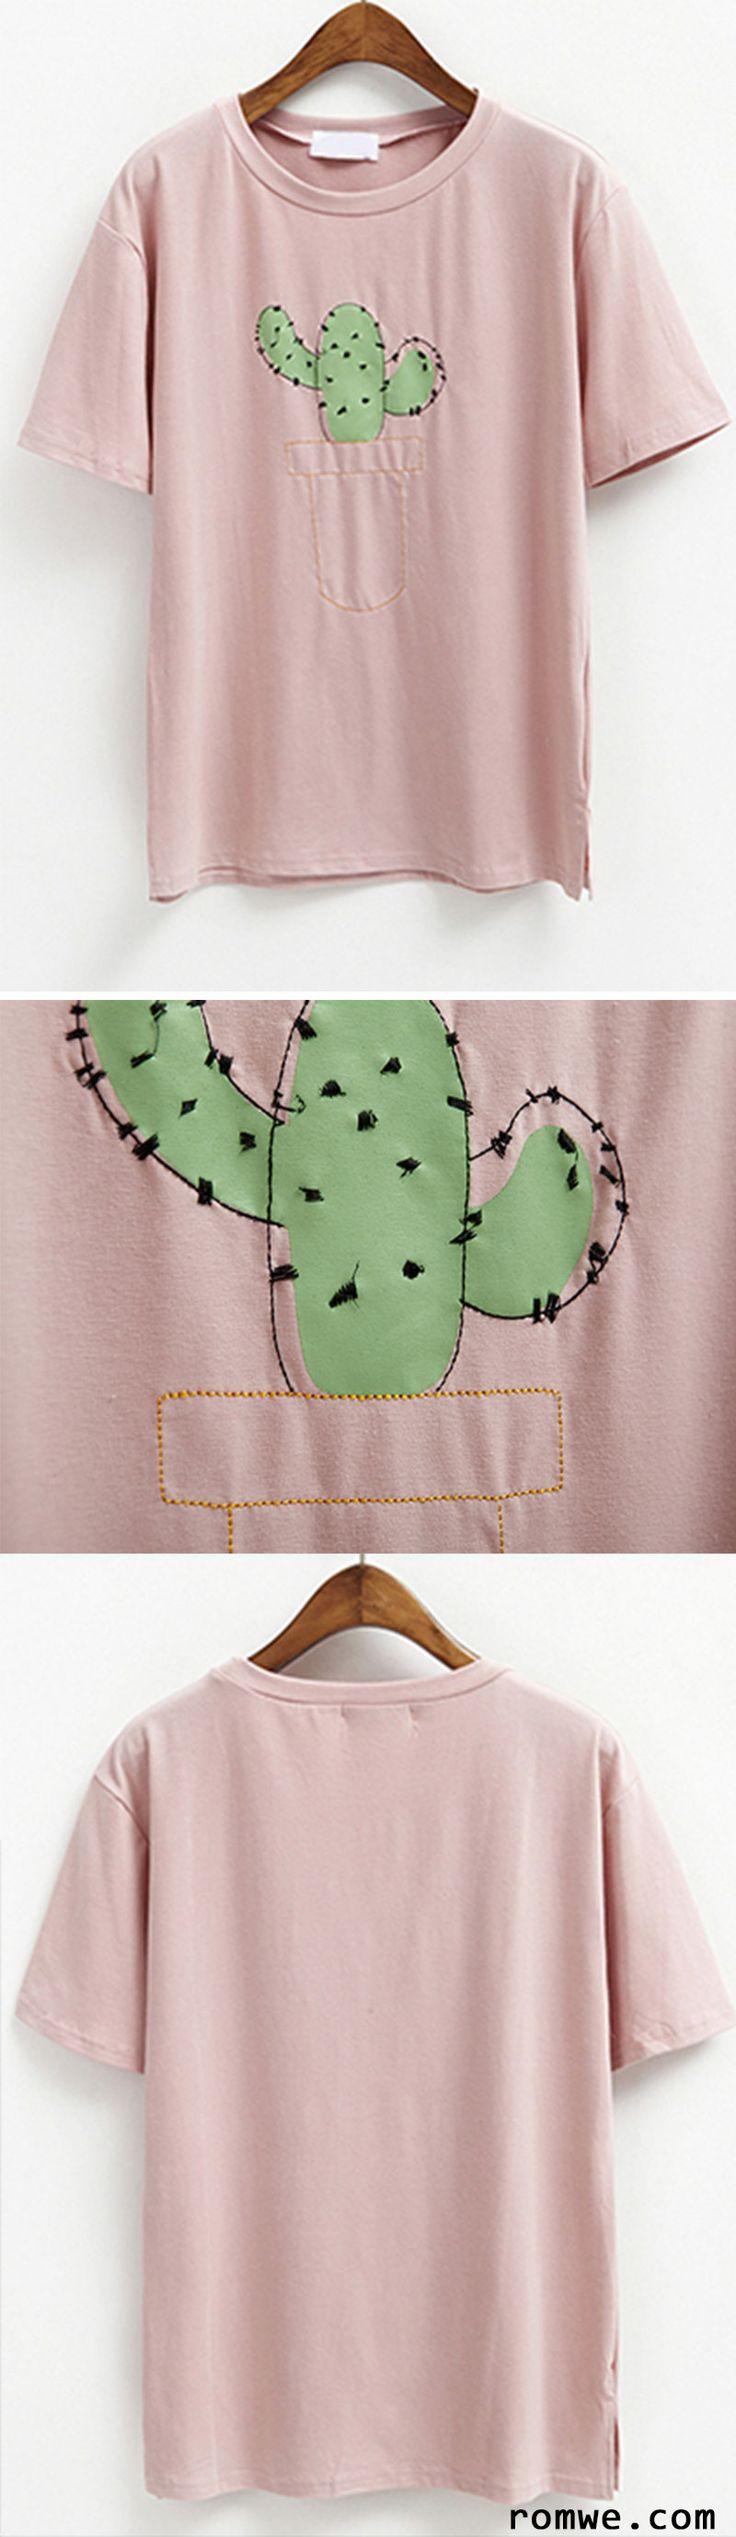 Fashion Style 2016- Cactus Print Short Sleeve T-shirt from romwe.com